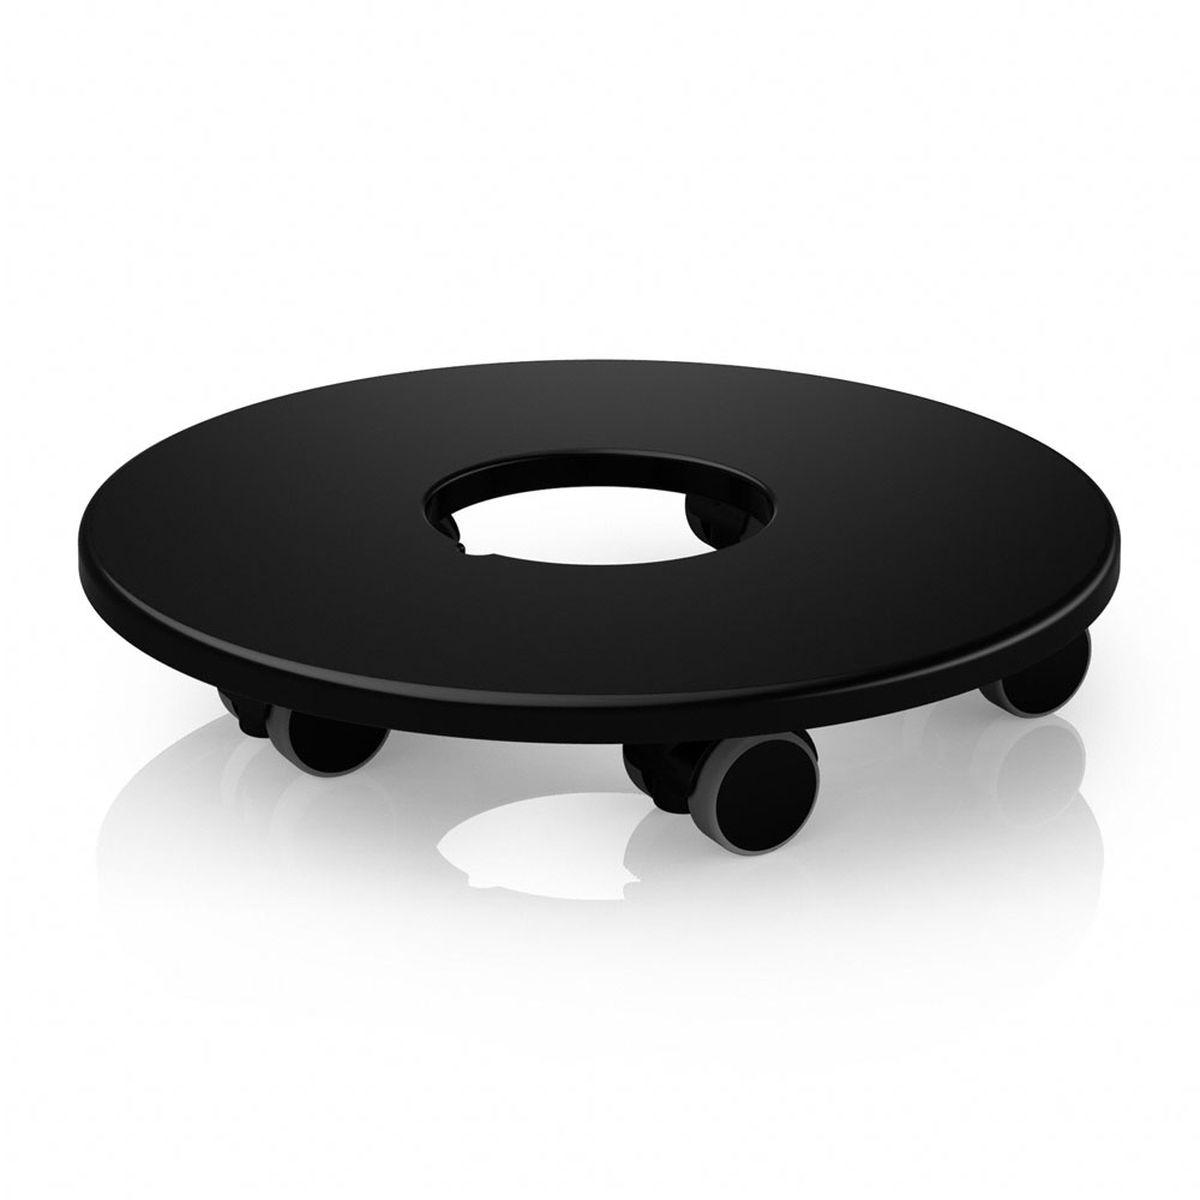 Подставка для кашпо Lechuza, на колесах, диаметр 25,5 см подставки для кашпо